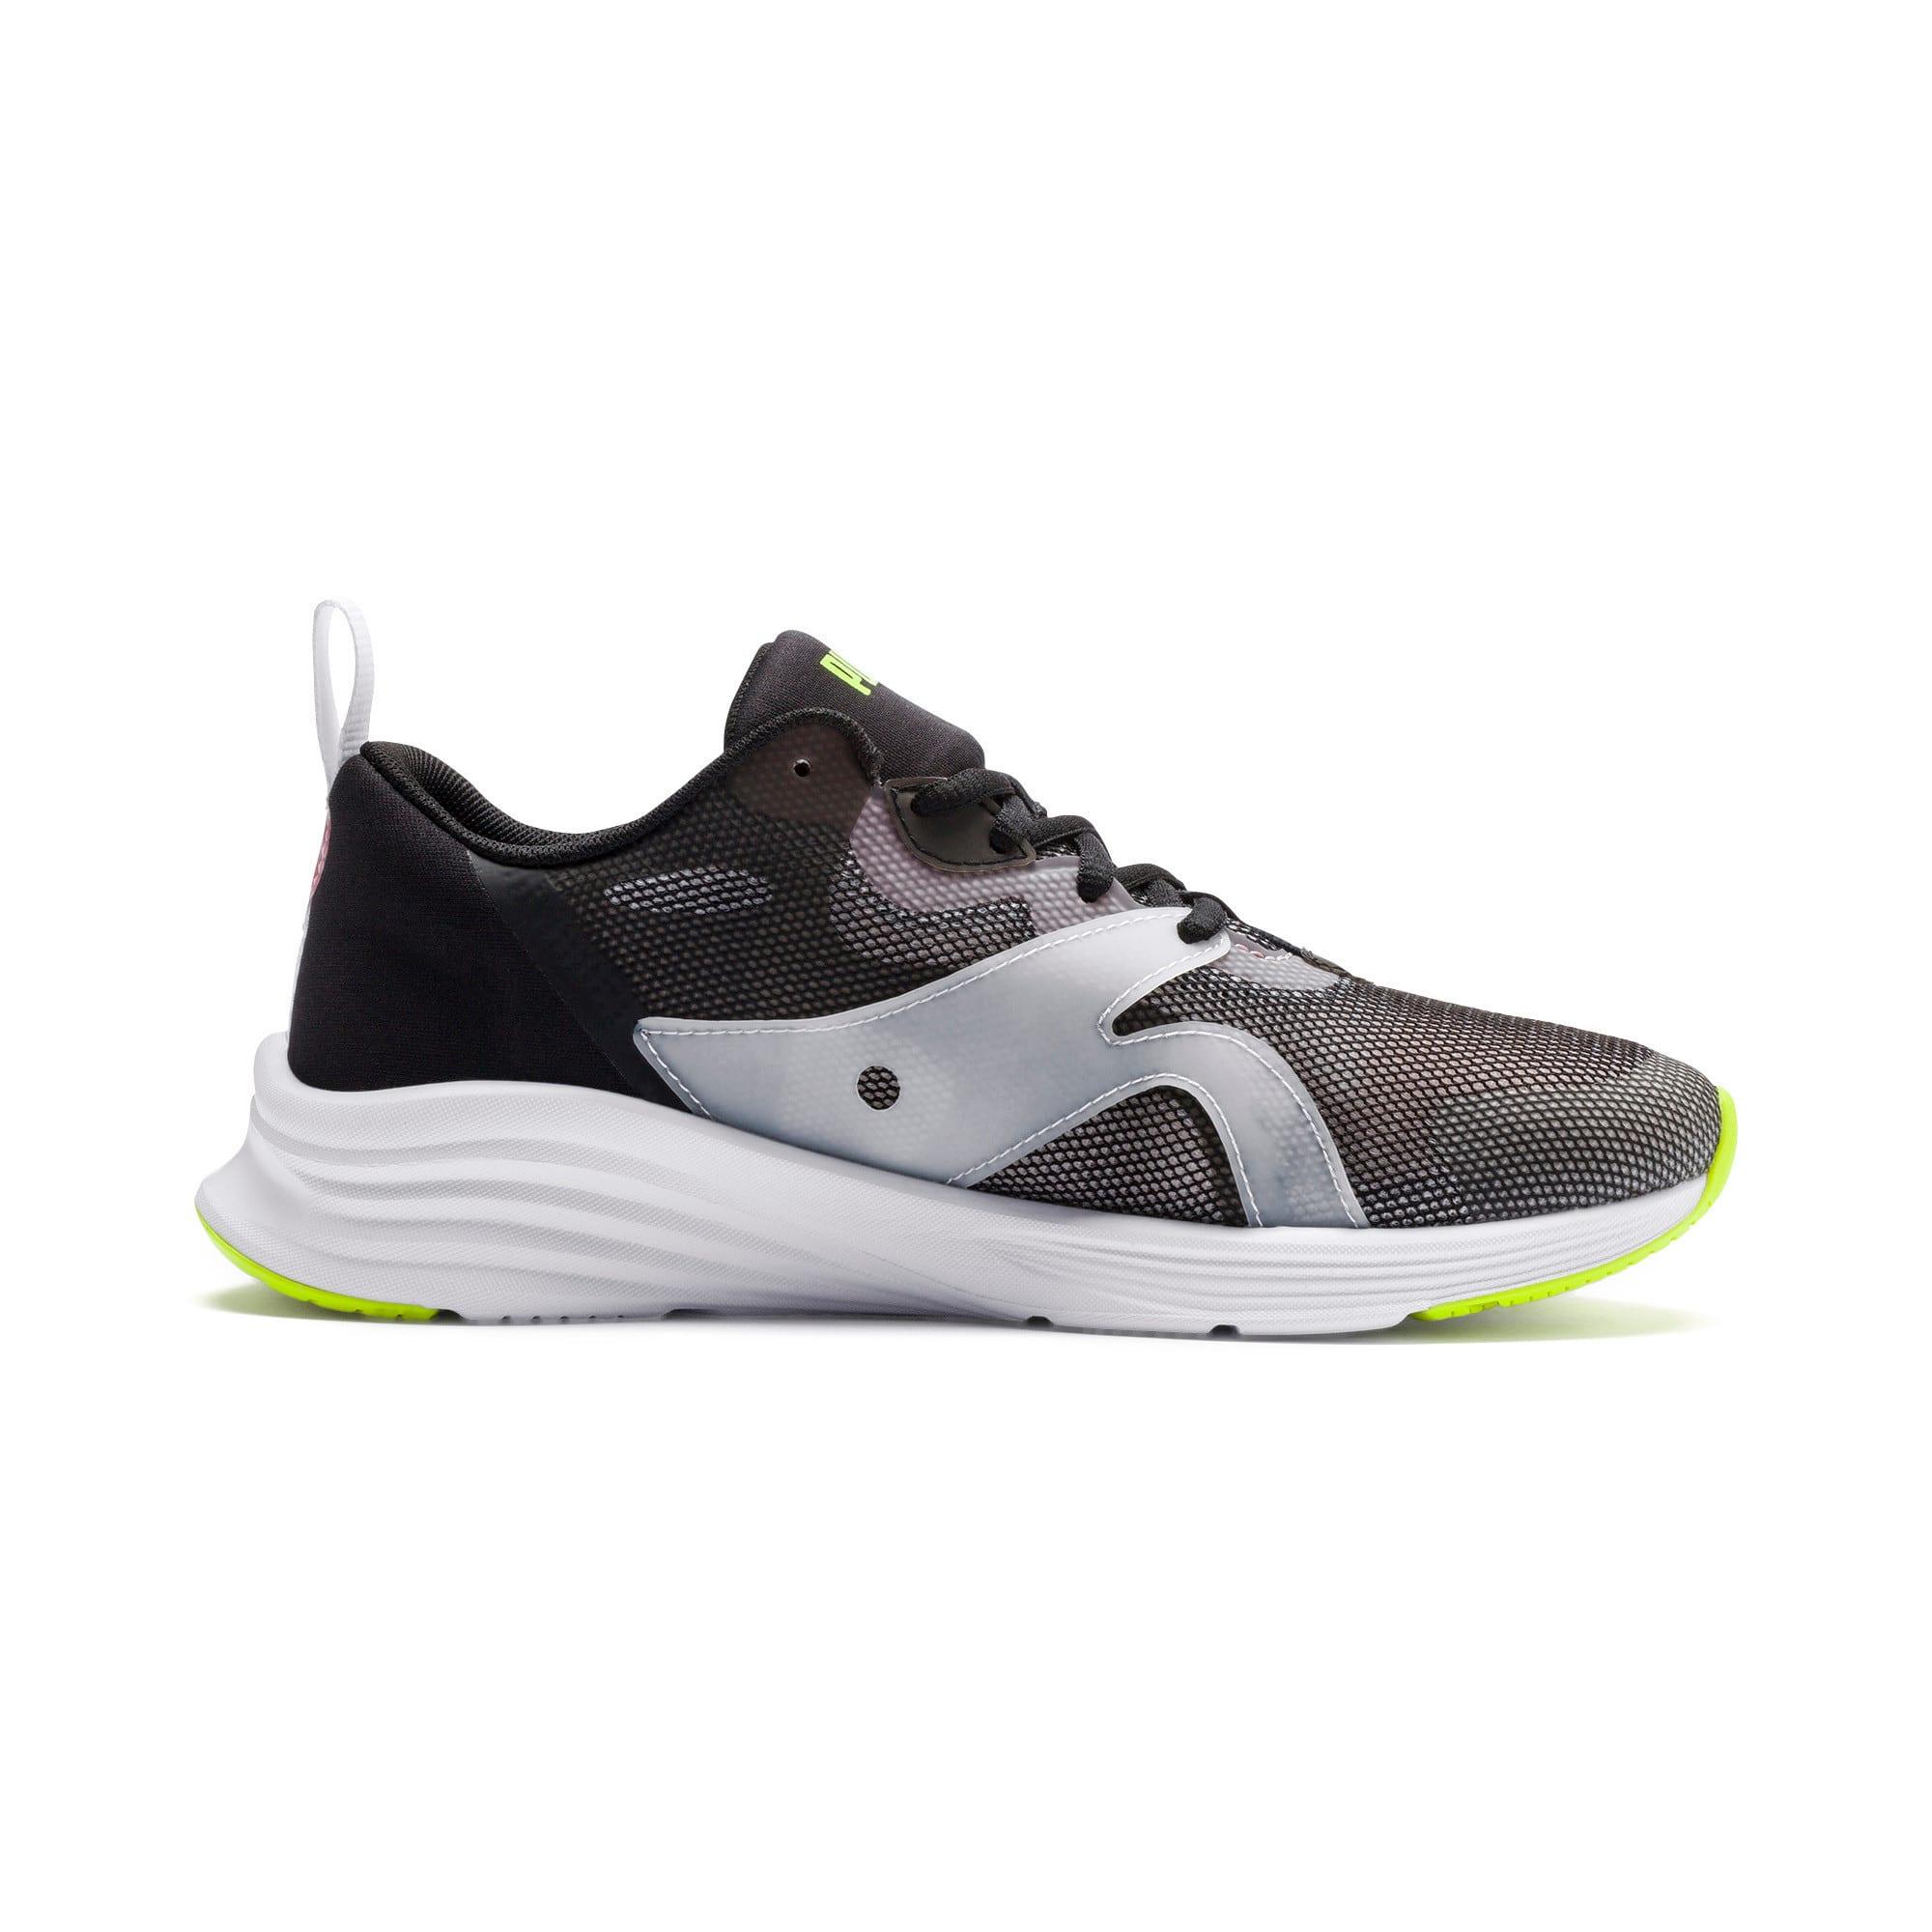 Thumbnail 5 of HYBRID Fuego Shift Women's Running Shoes, Puma Black-Bridal Rose, medium-IND